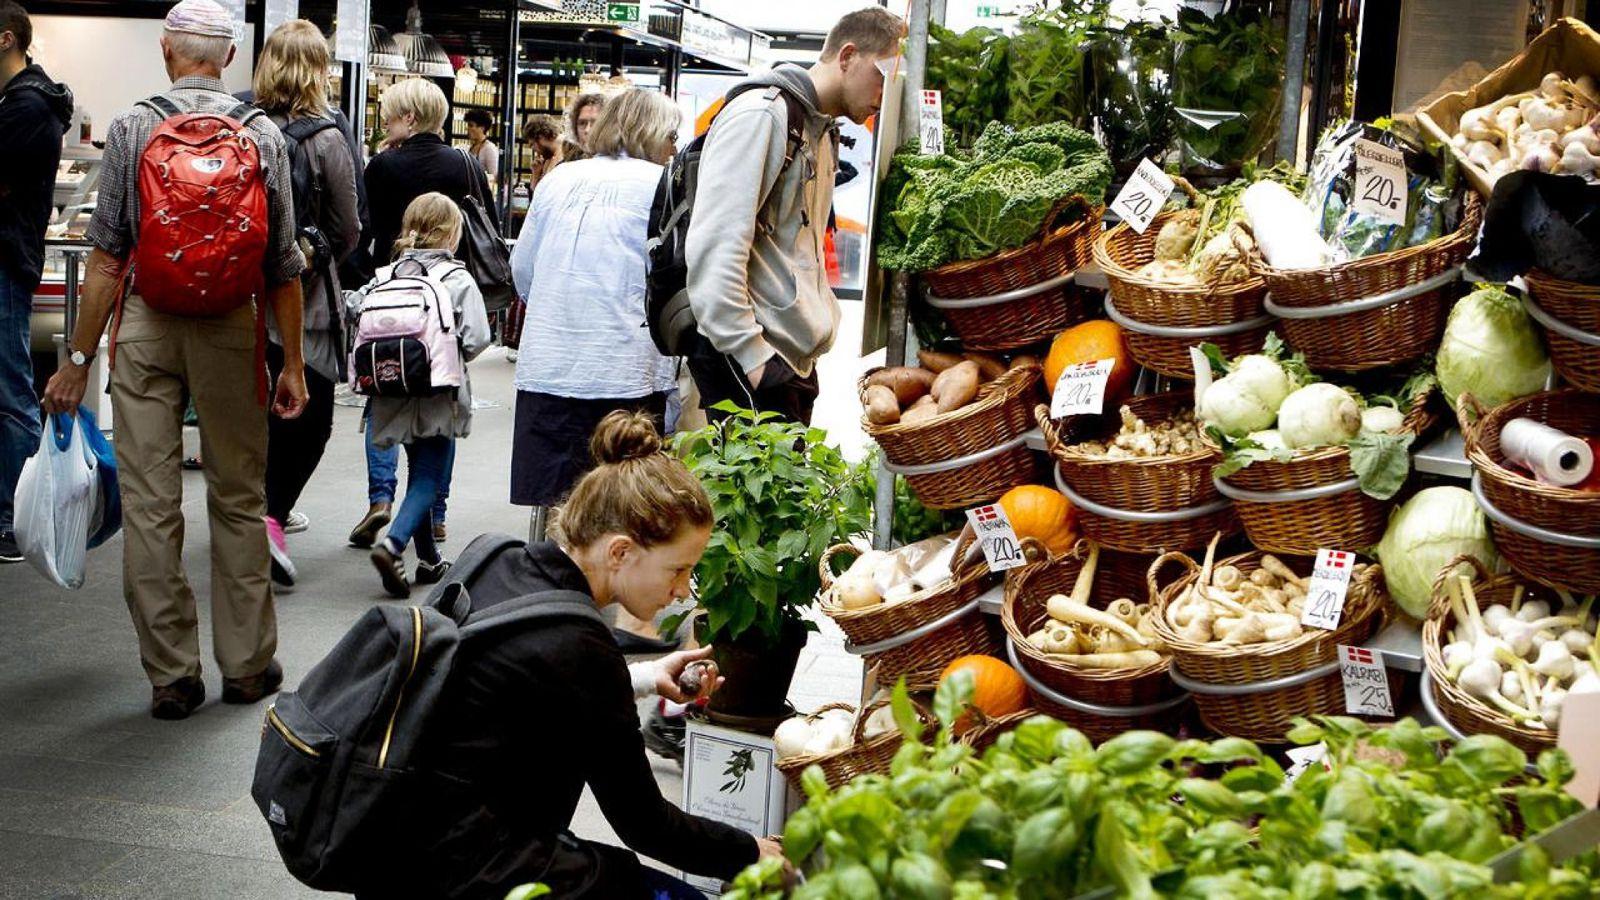 Torvehallerne – Copenhagen food hall Market (1)